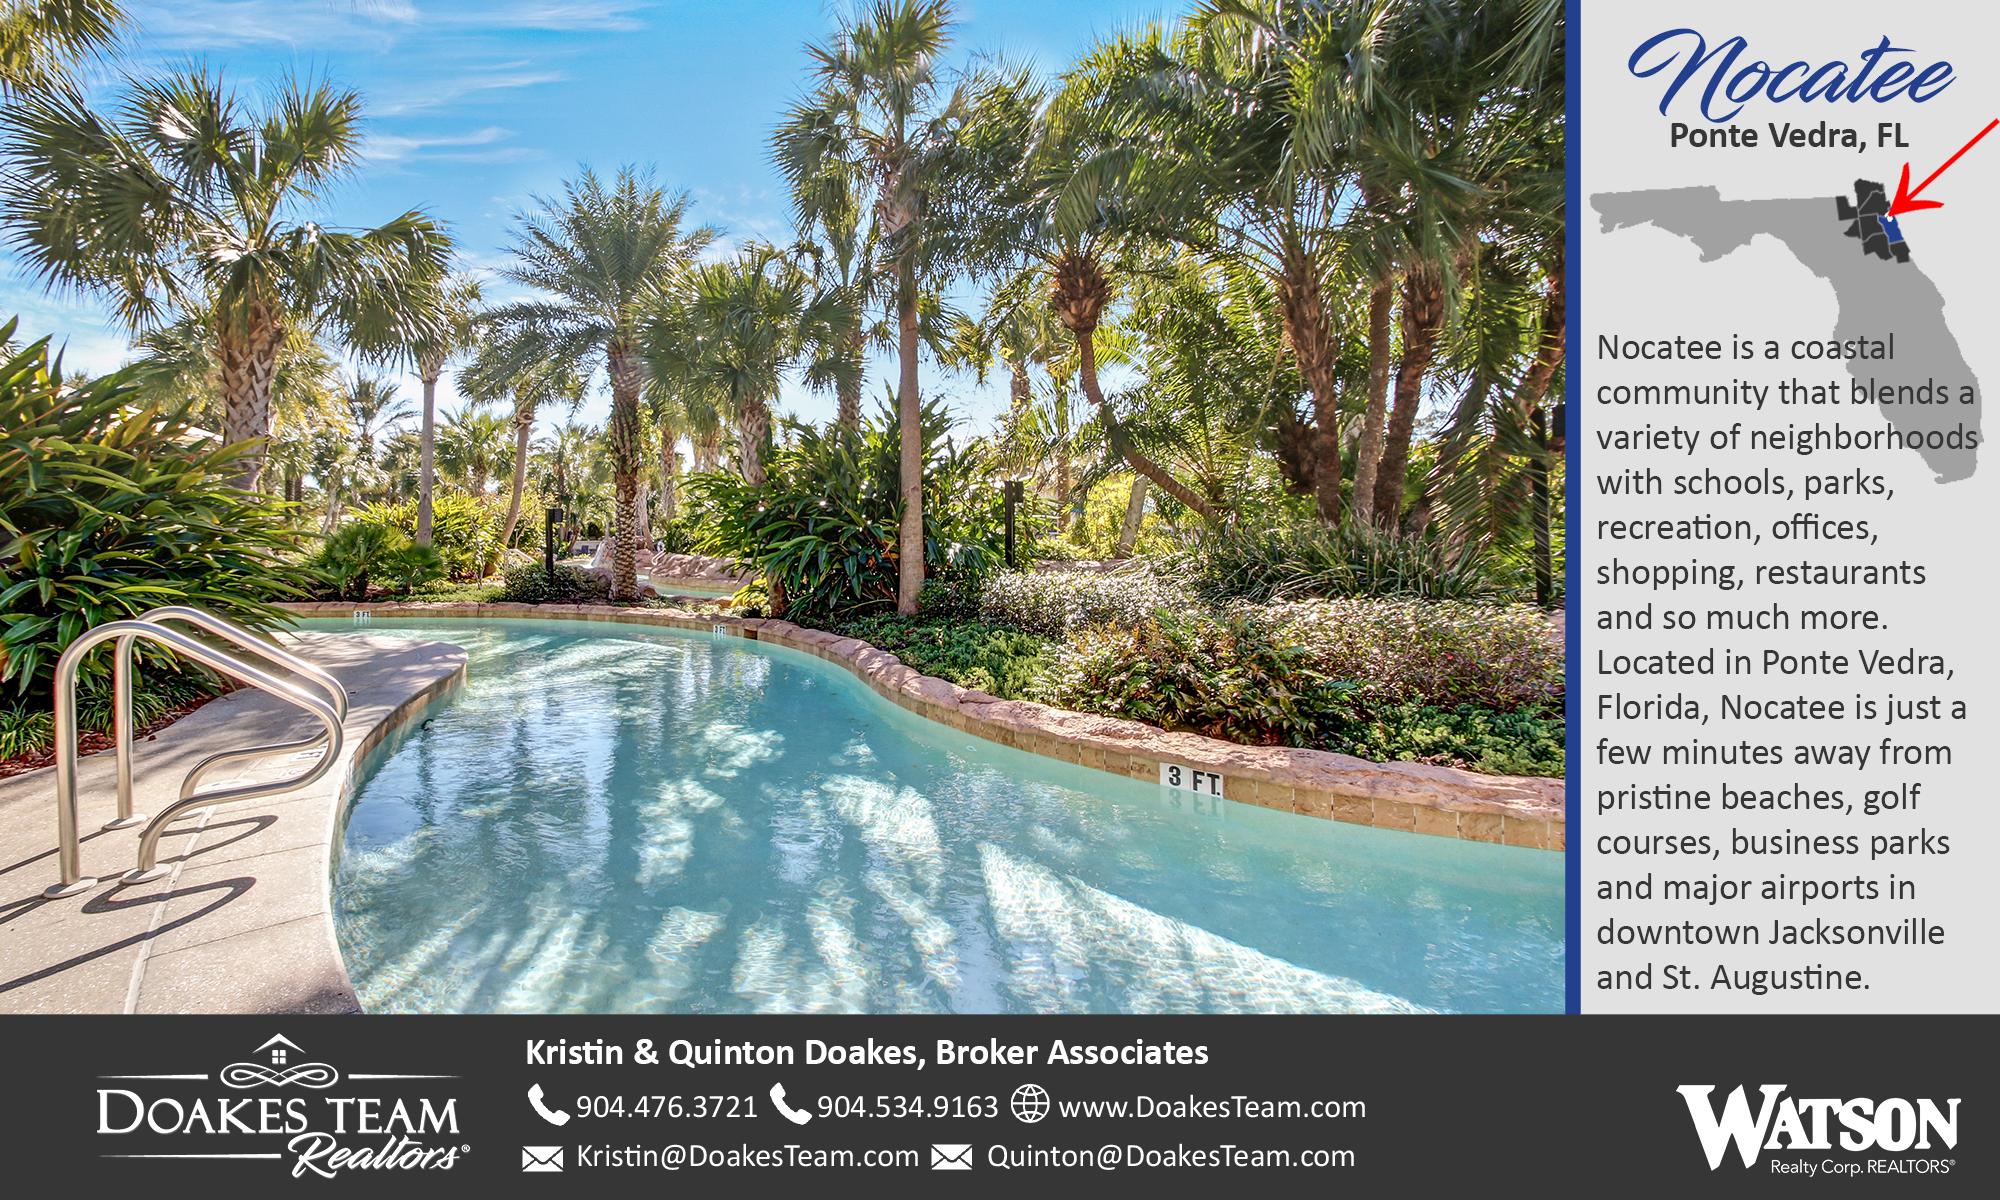 Homes for Sale in Nocatee, FL 32081 Ponte vedra beach